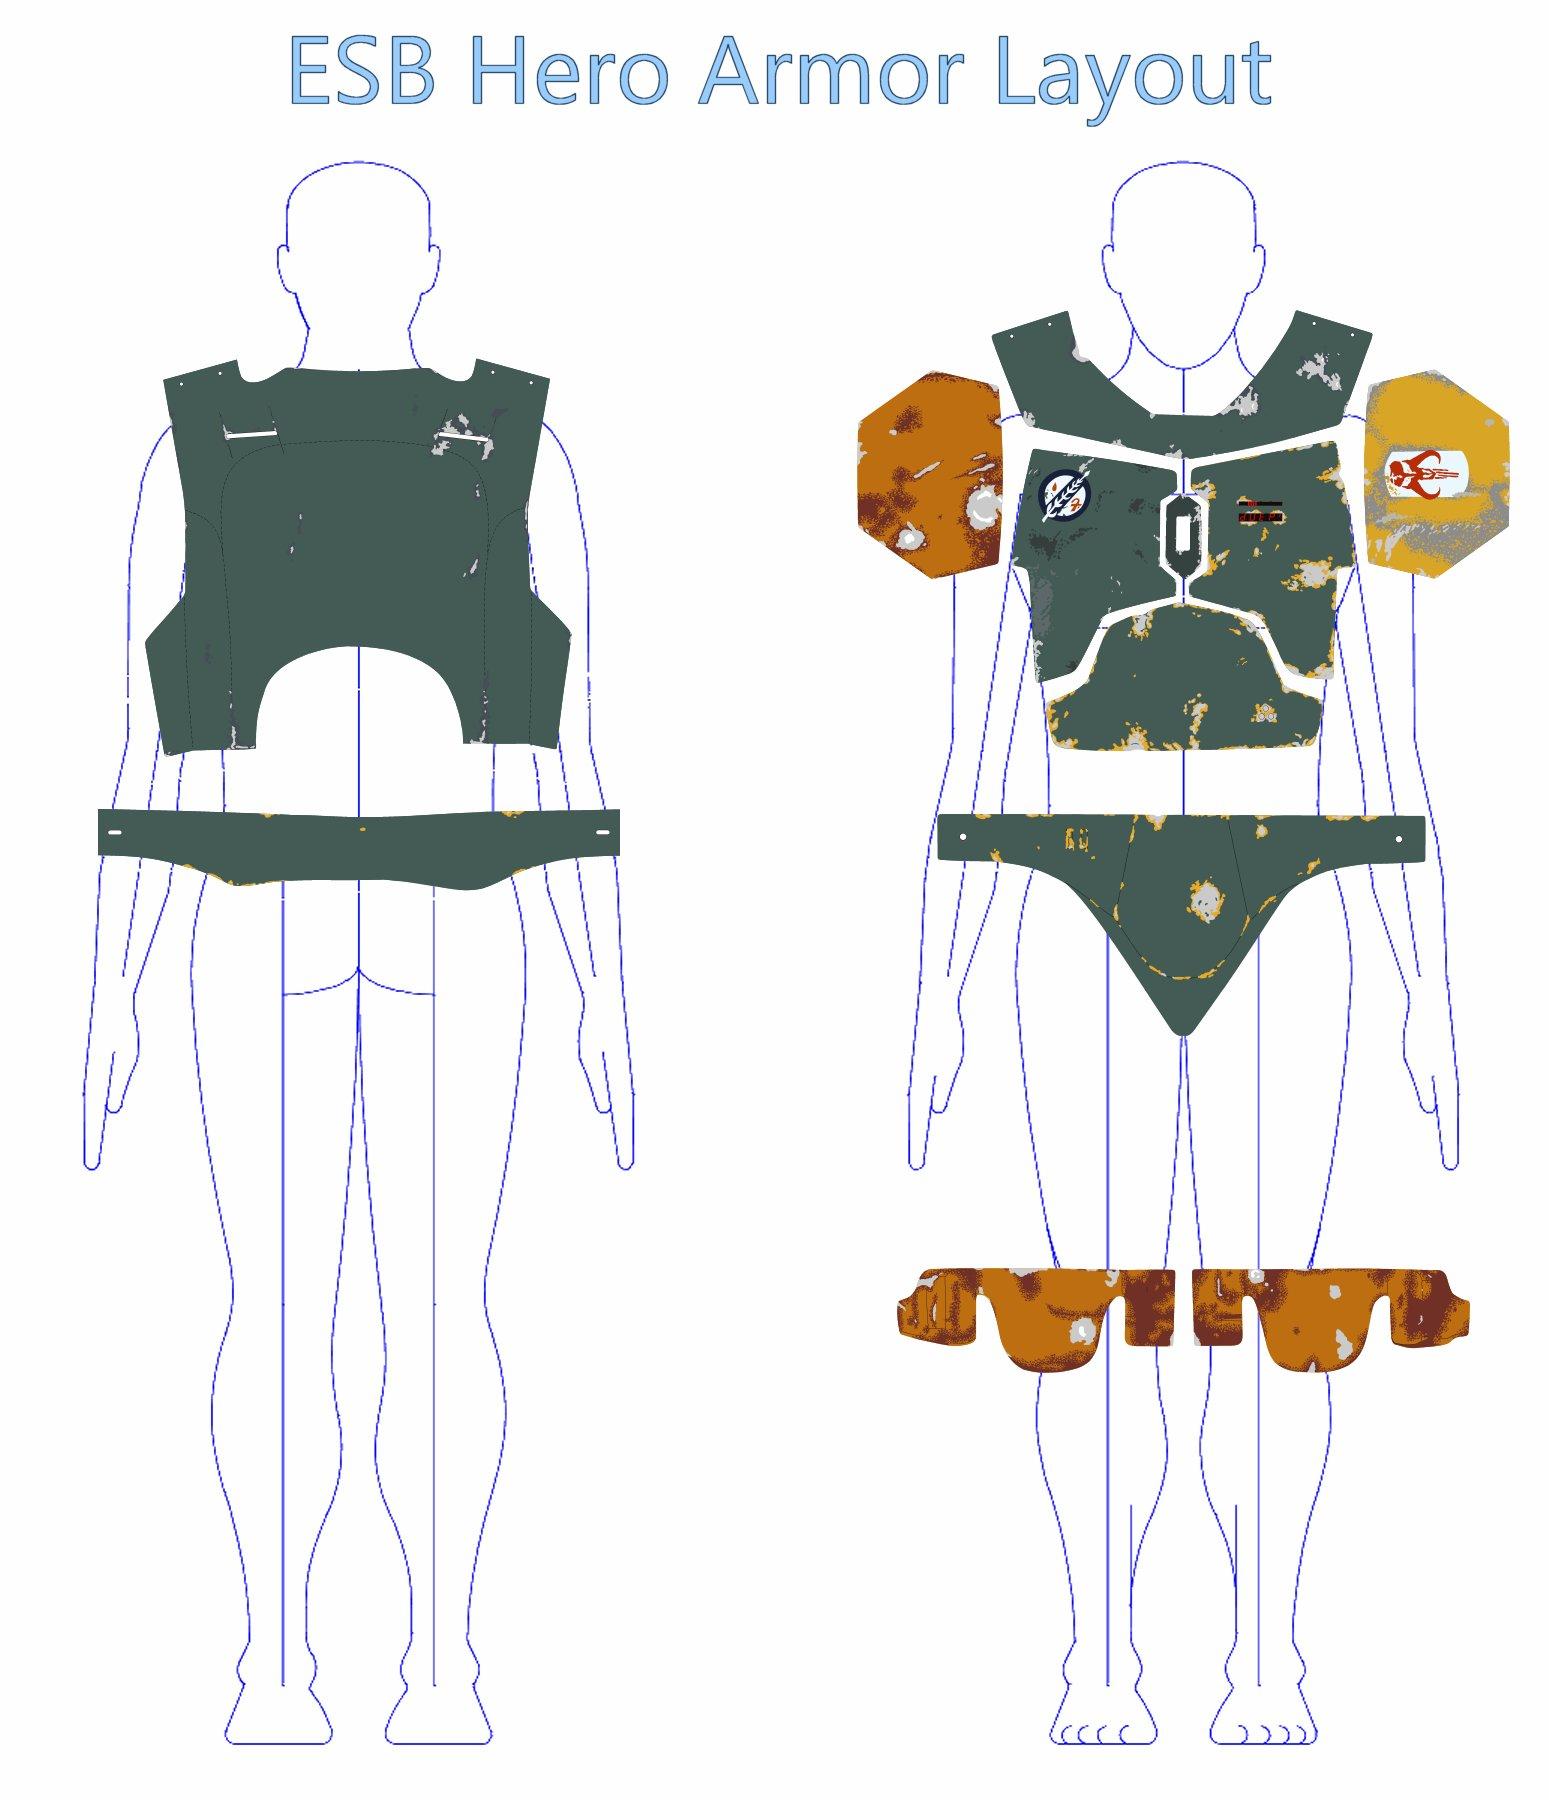 Boba Fett ESB Armor Stencils | Boba Fett Costume and Prop Maker ...